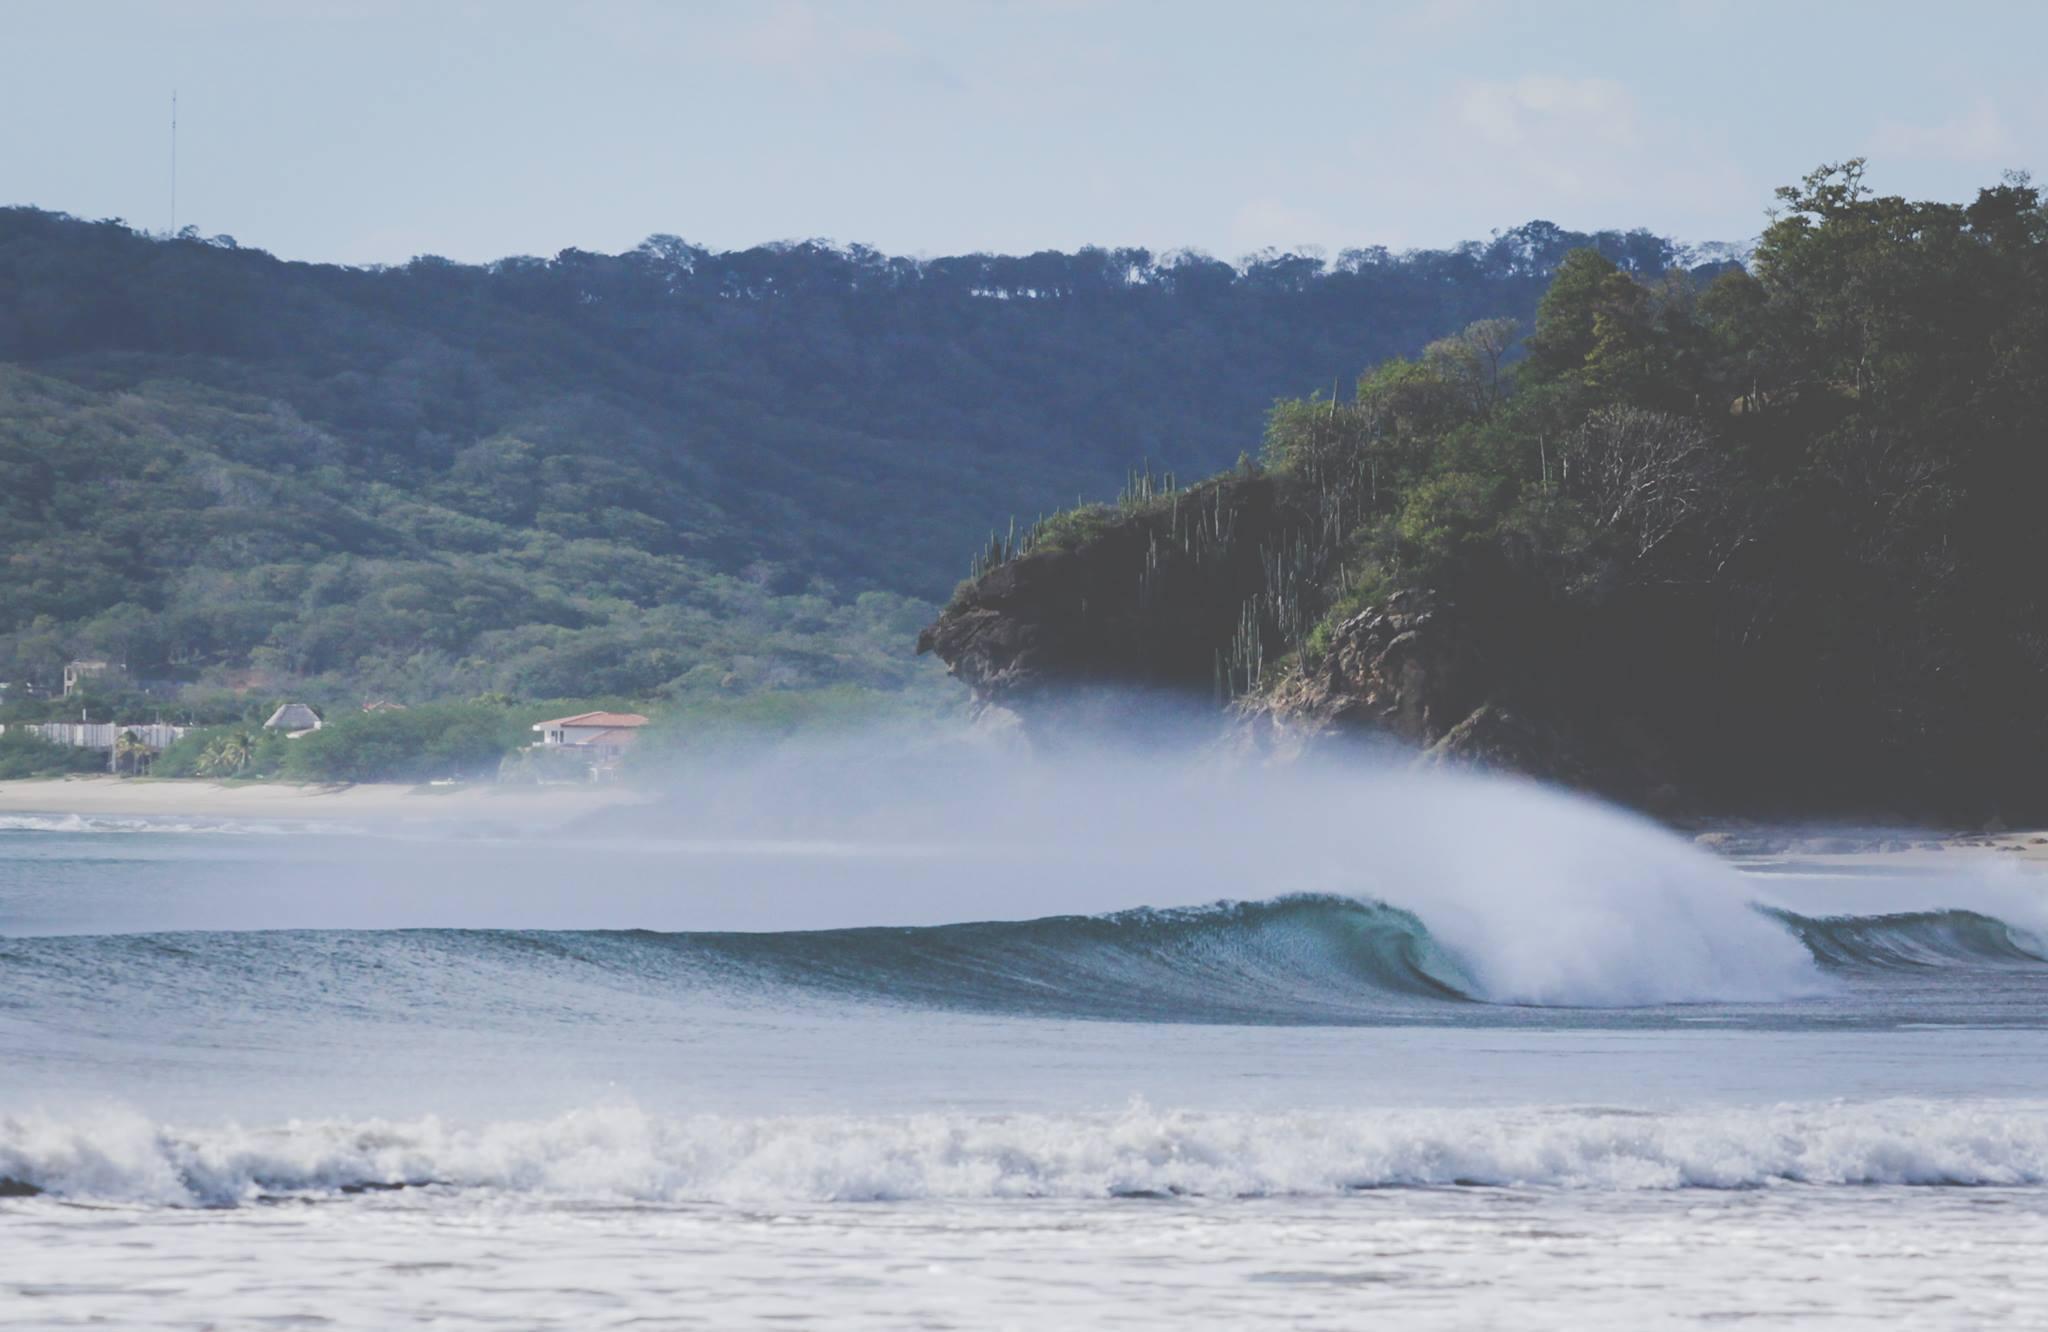 nicaragua wave